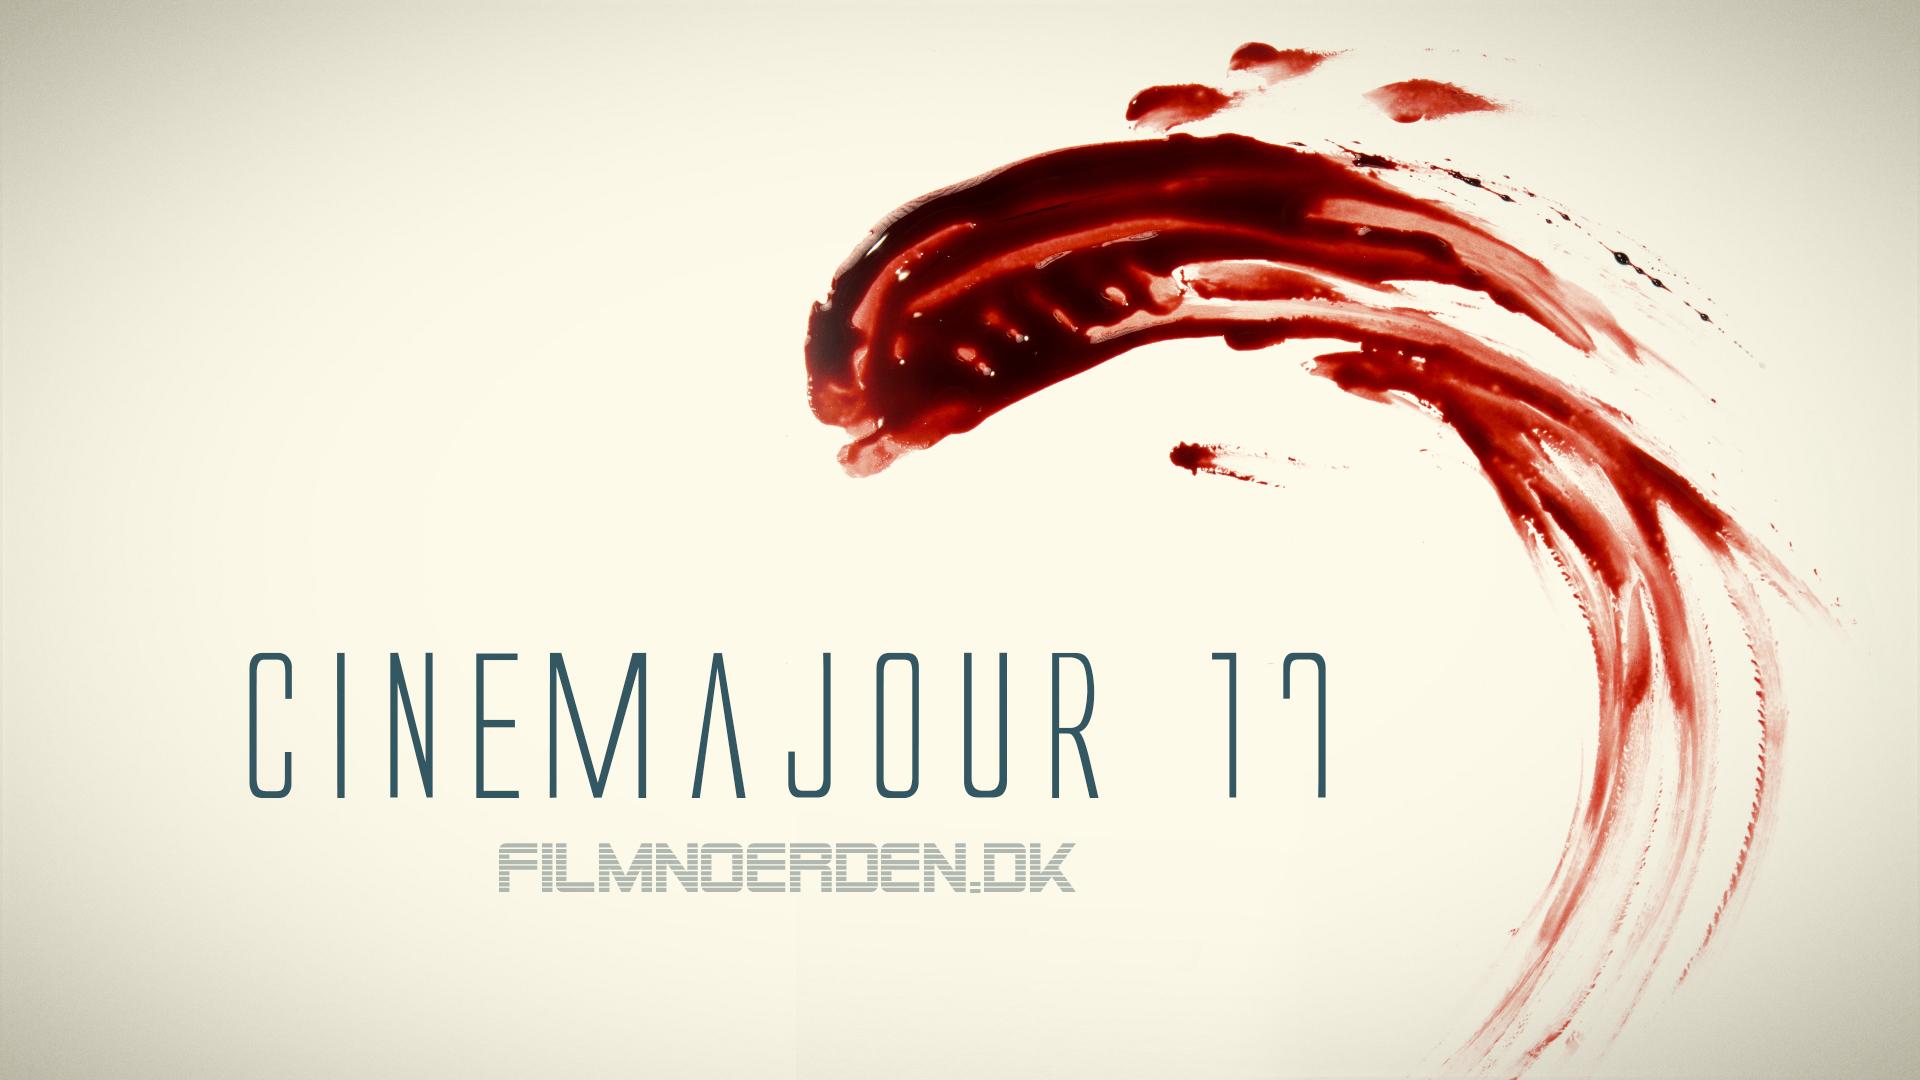 Cinemajour ep. 17 PR1